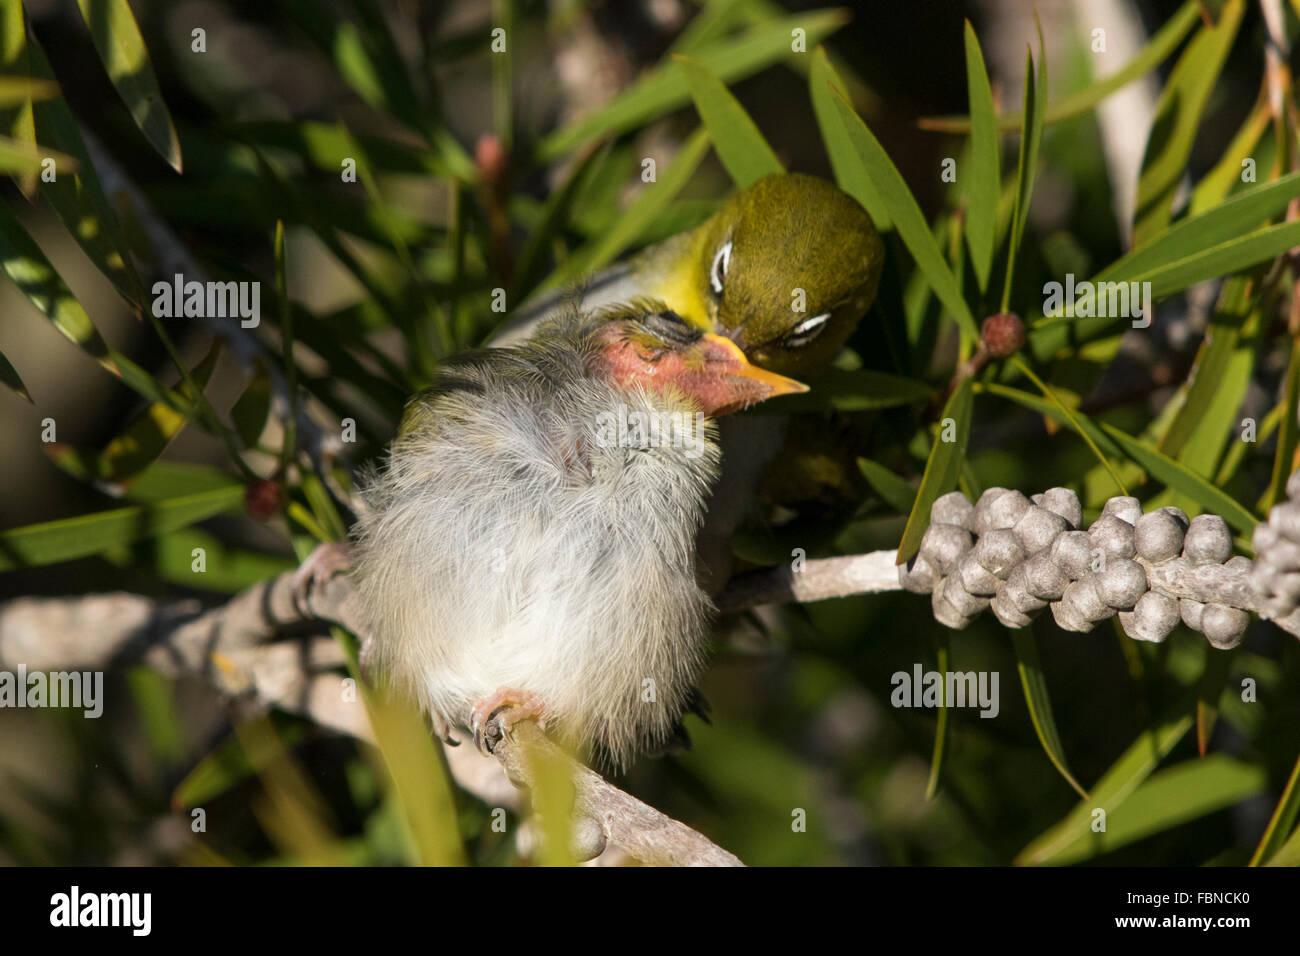 Silvereye (Zosterops lateralis) feeding its chick - Stock Image